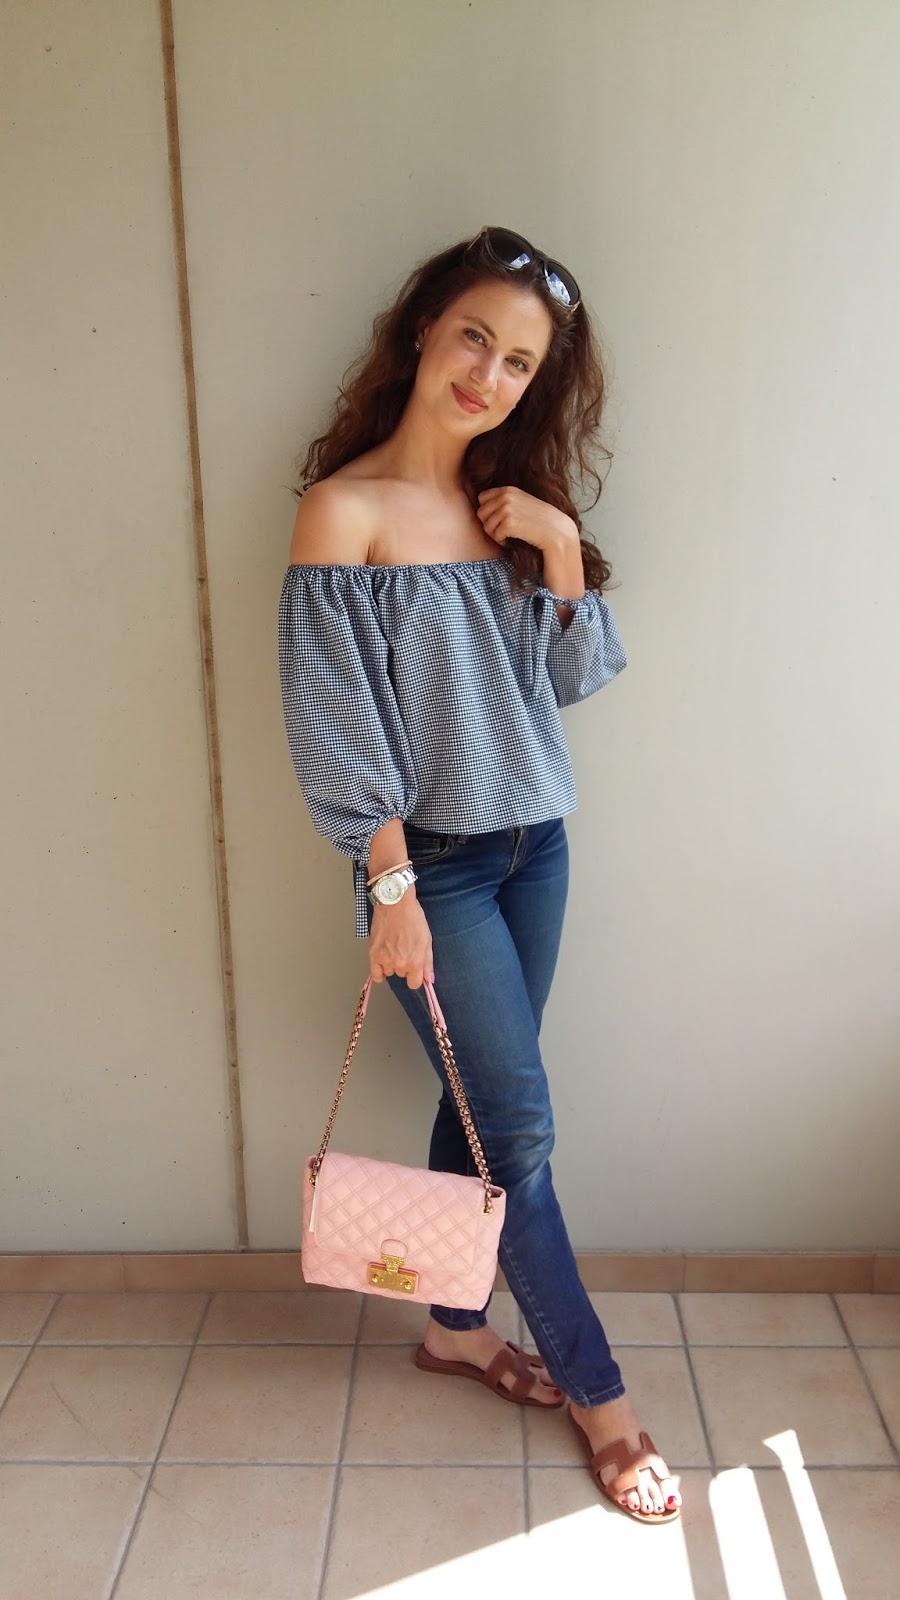 blogger, swiss blogger, ots, off the shoulder, gingham, zara, marc jacobs, pink handbag, marc jacobs baroque